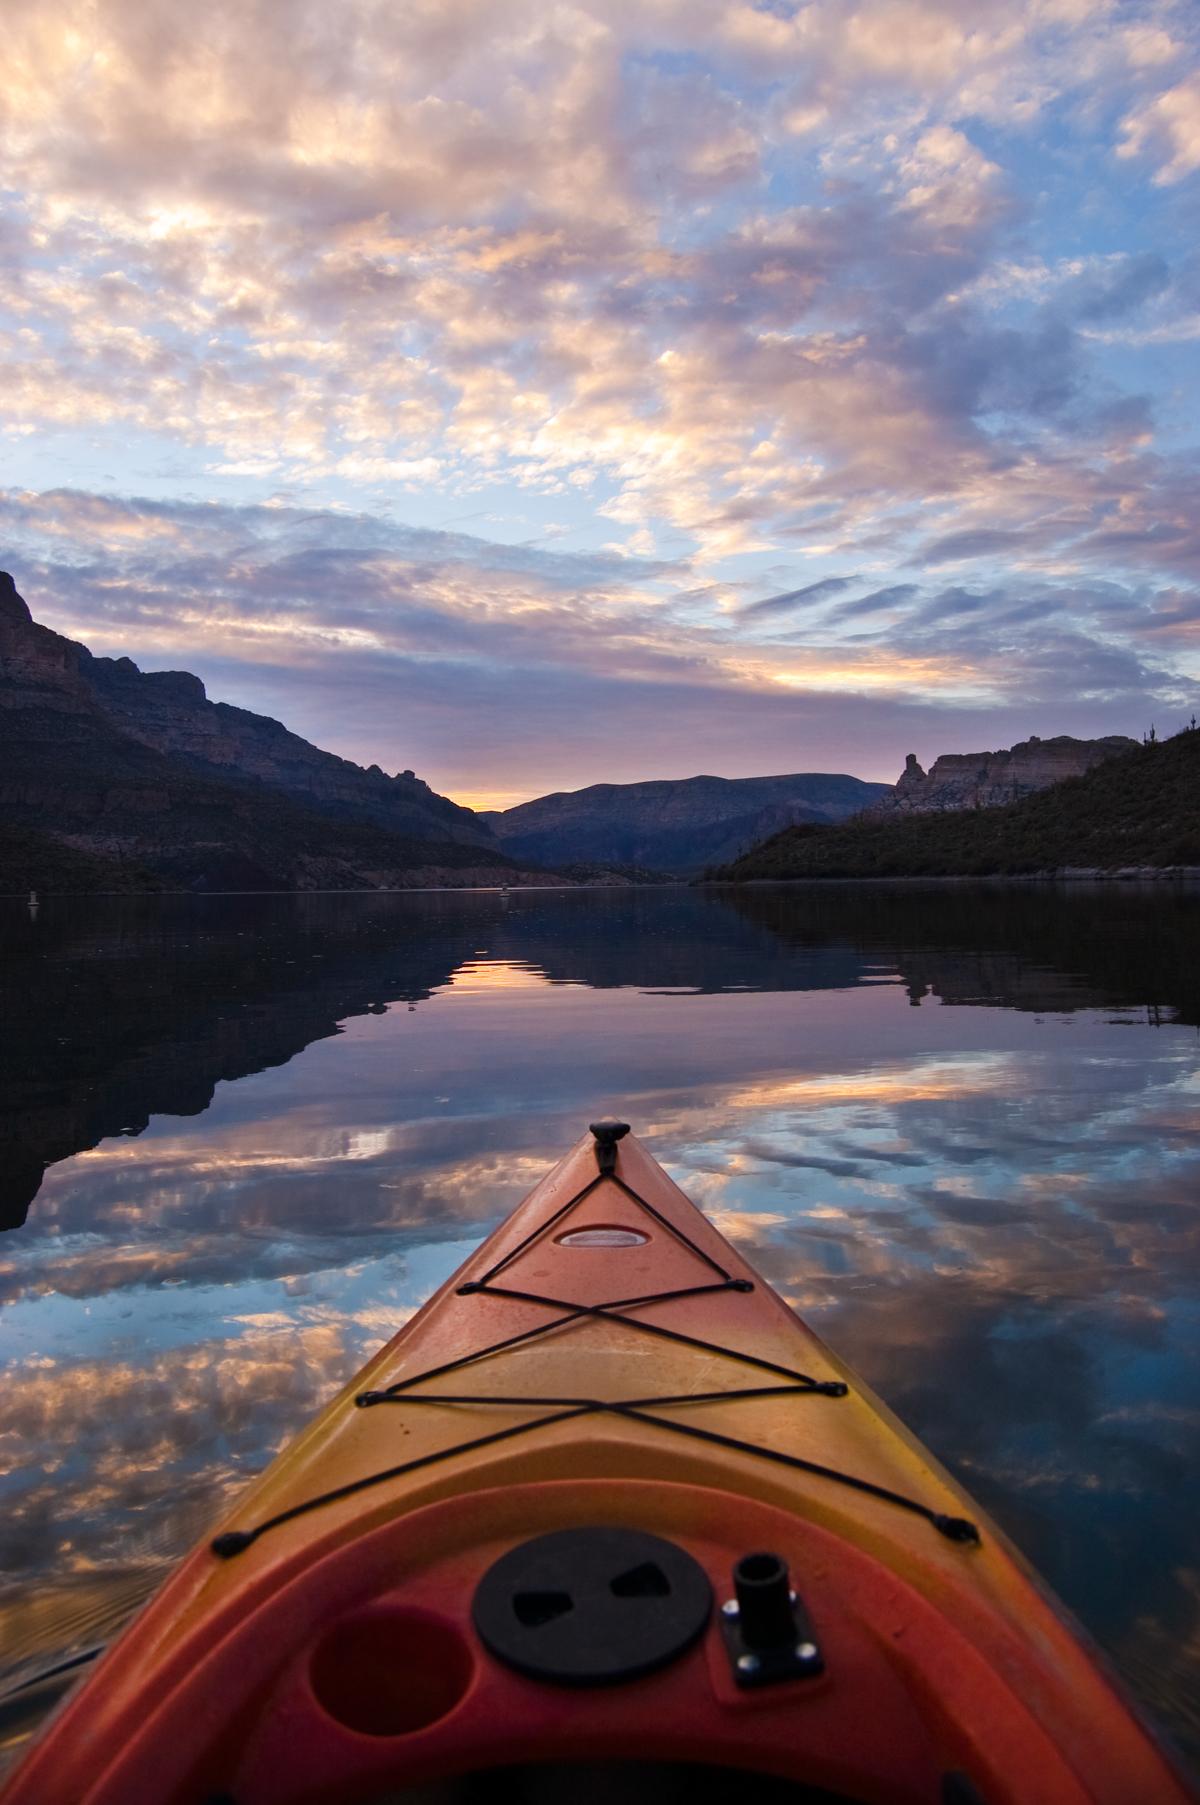 Kayak Sunset on Apache Lake, Arizona